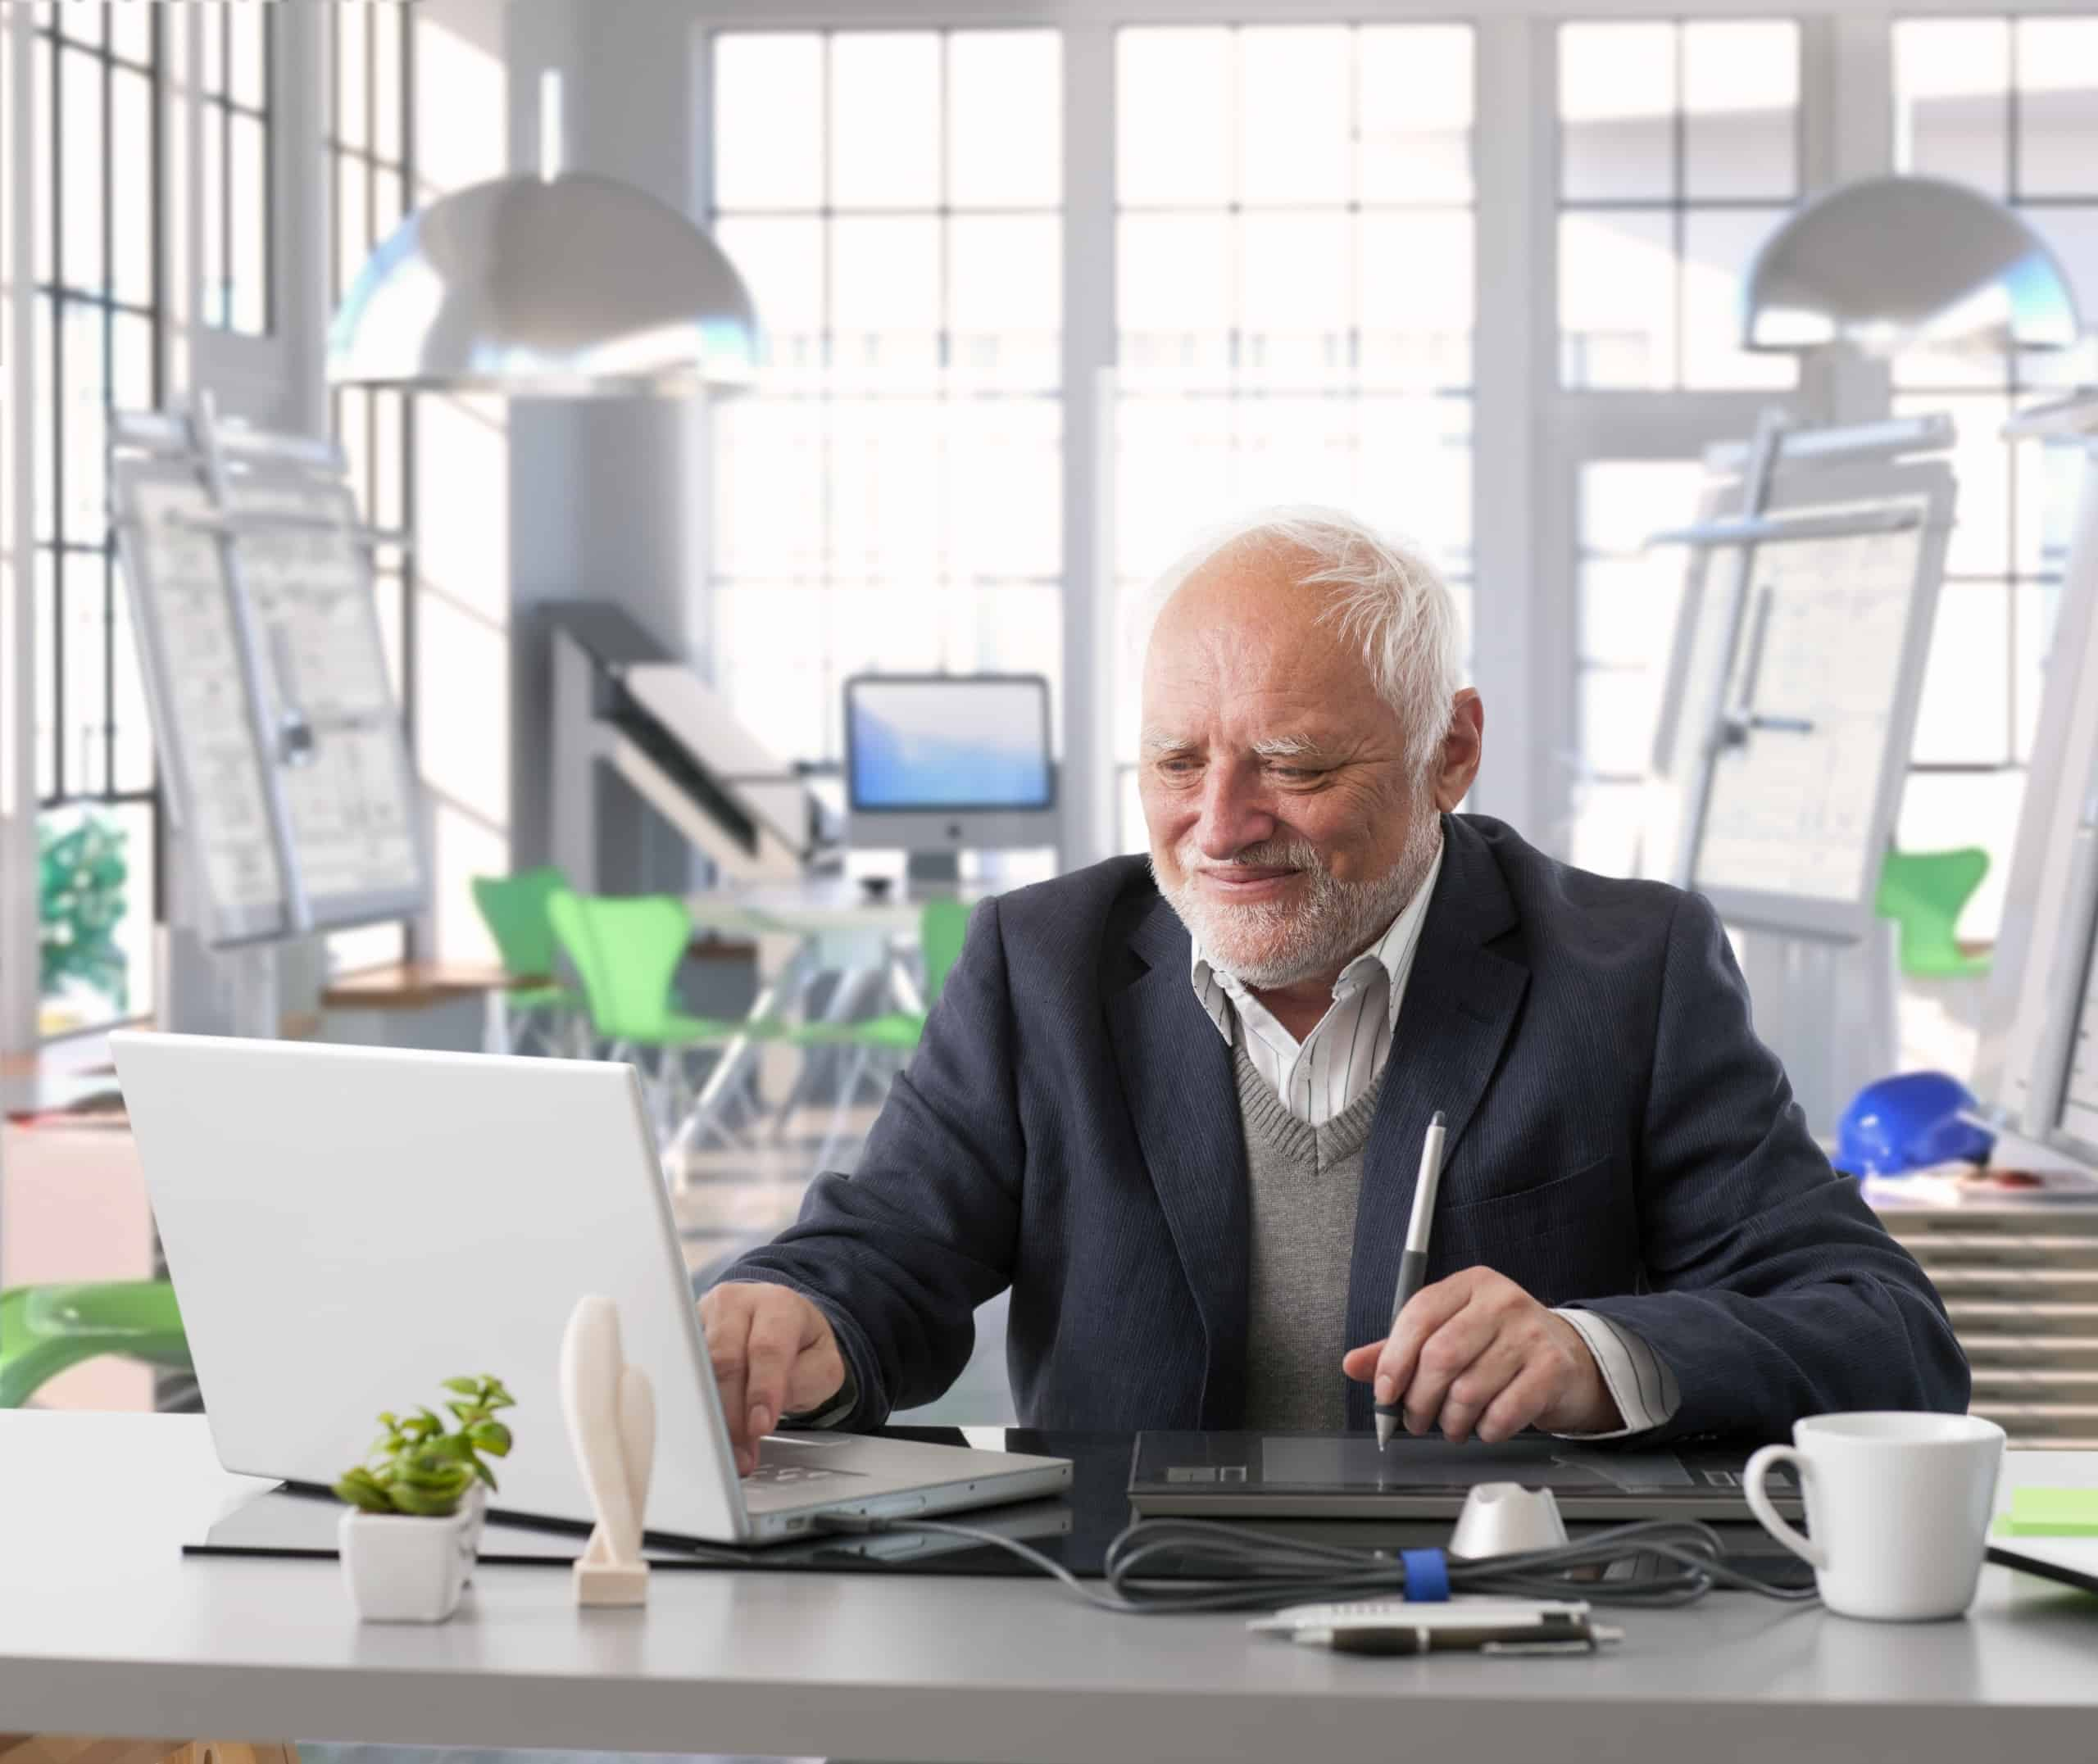 Senior employee working on laptop in office